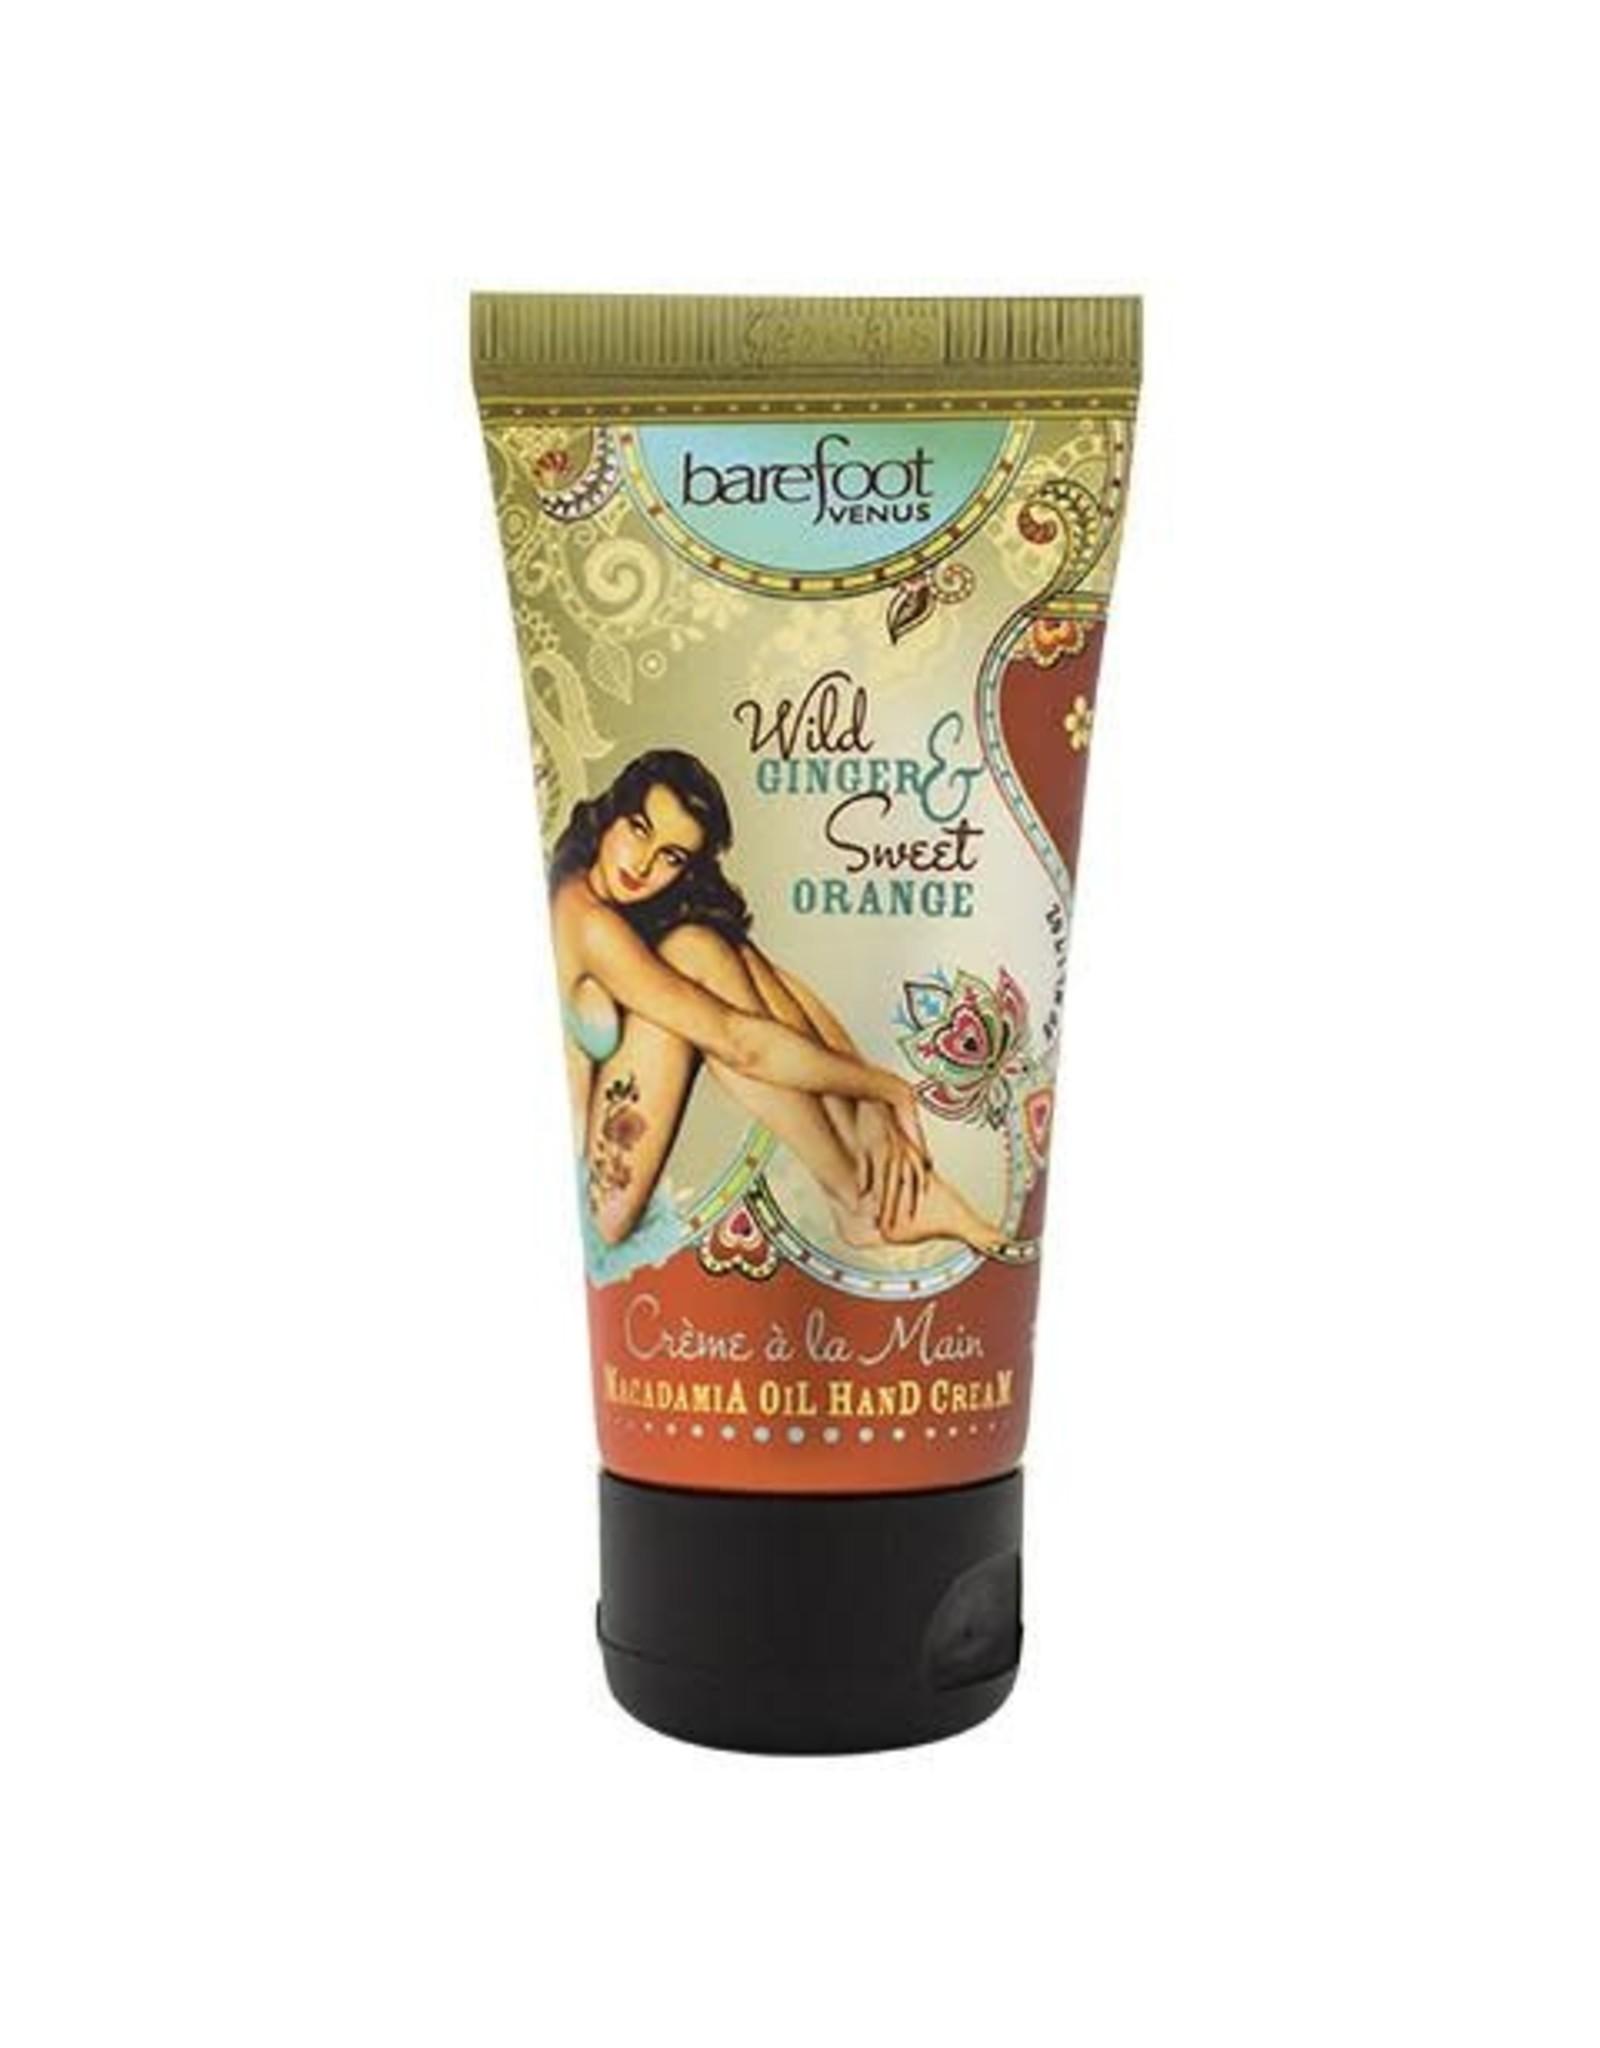 Barefoot Venus Barefoot Venus - Macadamia oil hand cream (multiple scents)